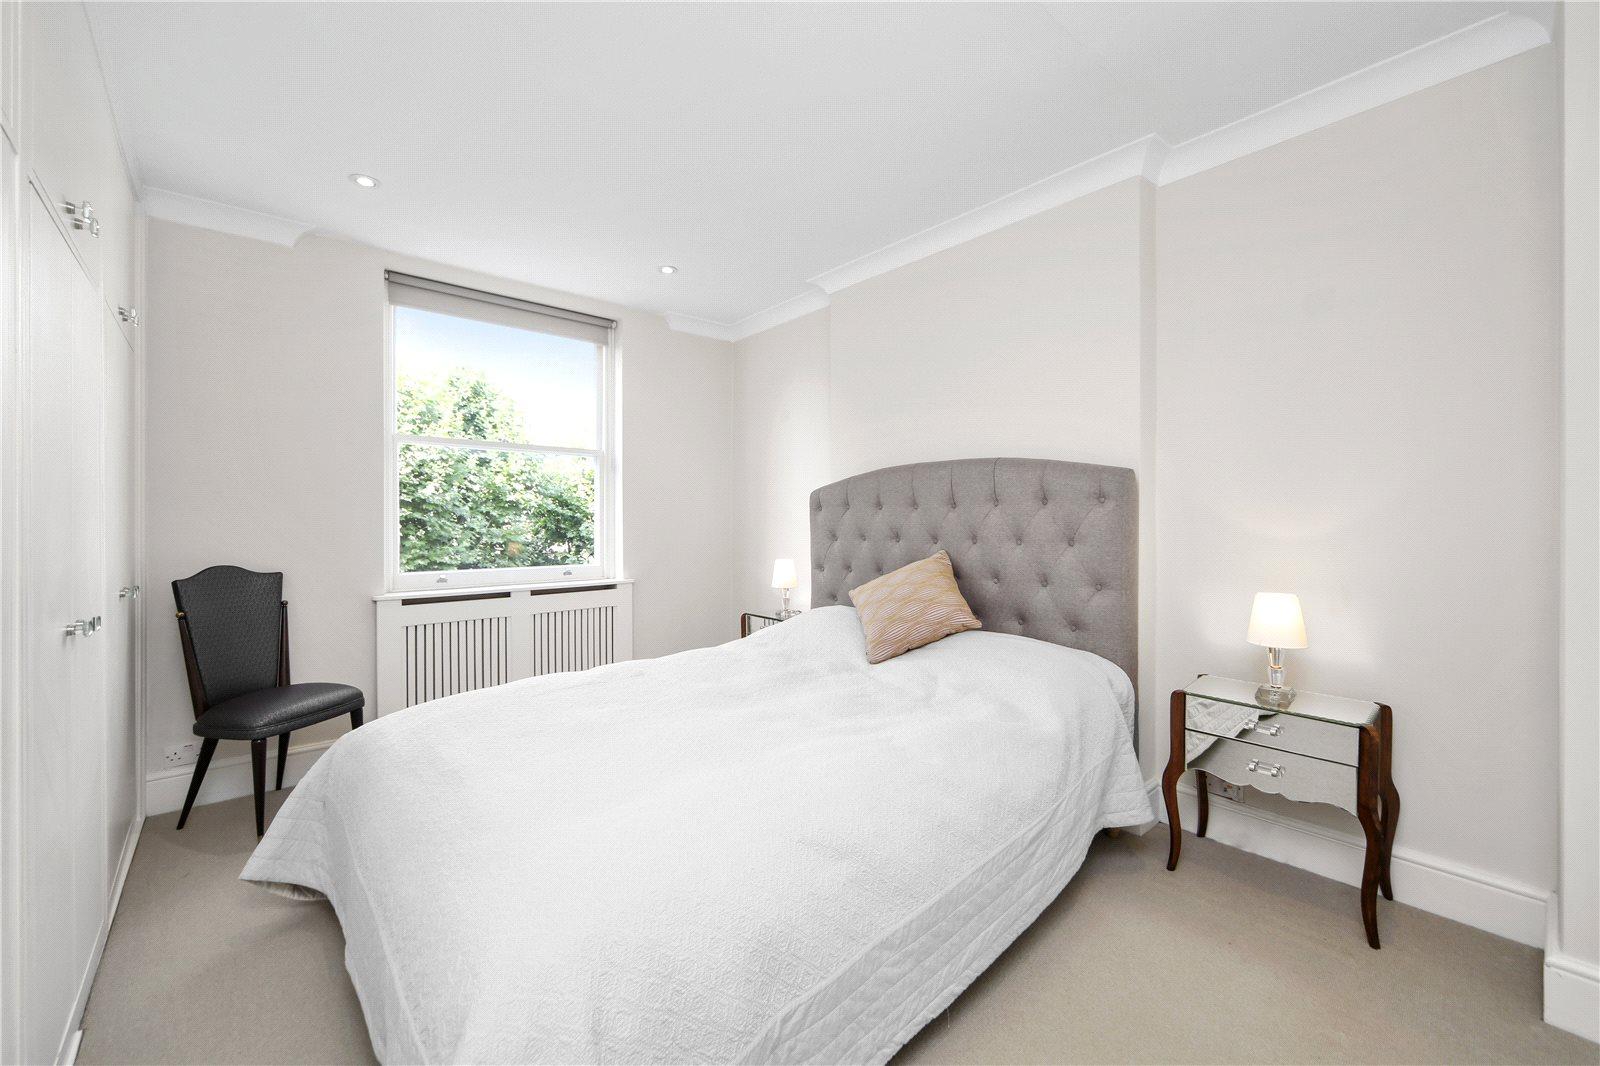 8205 cornwall - 2 Bedroom Leamington Road Villas London W11 Property To Let Marsh Parsons